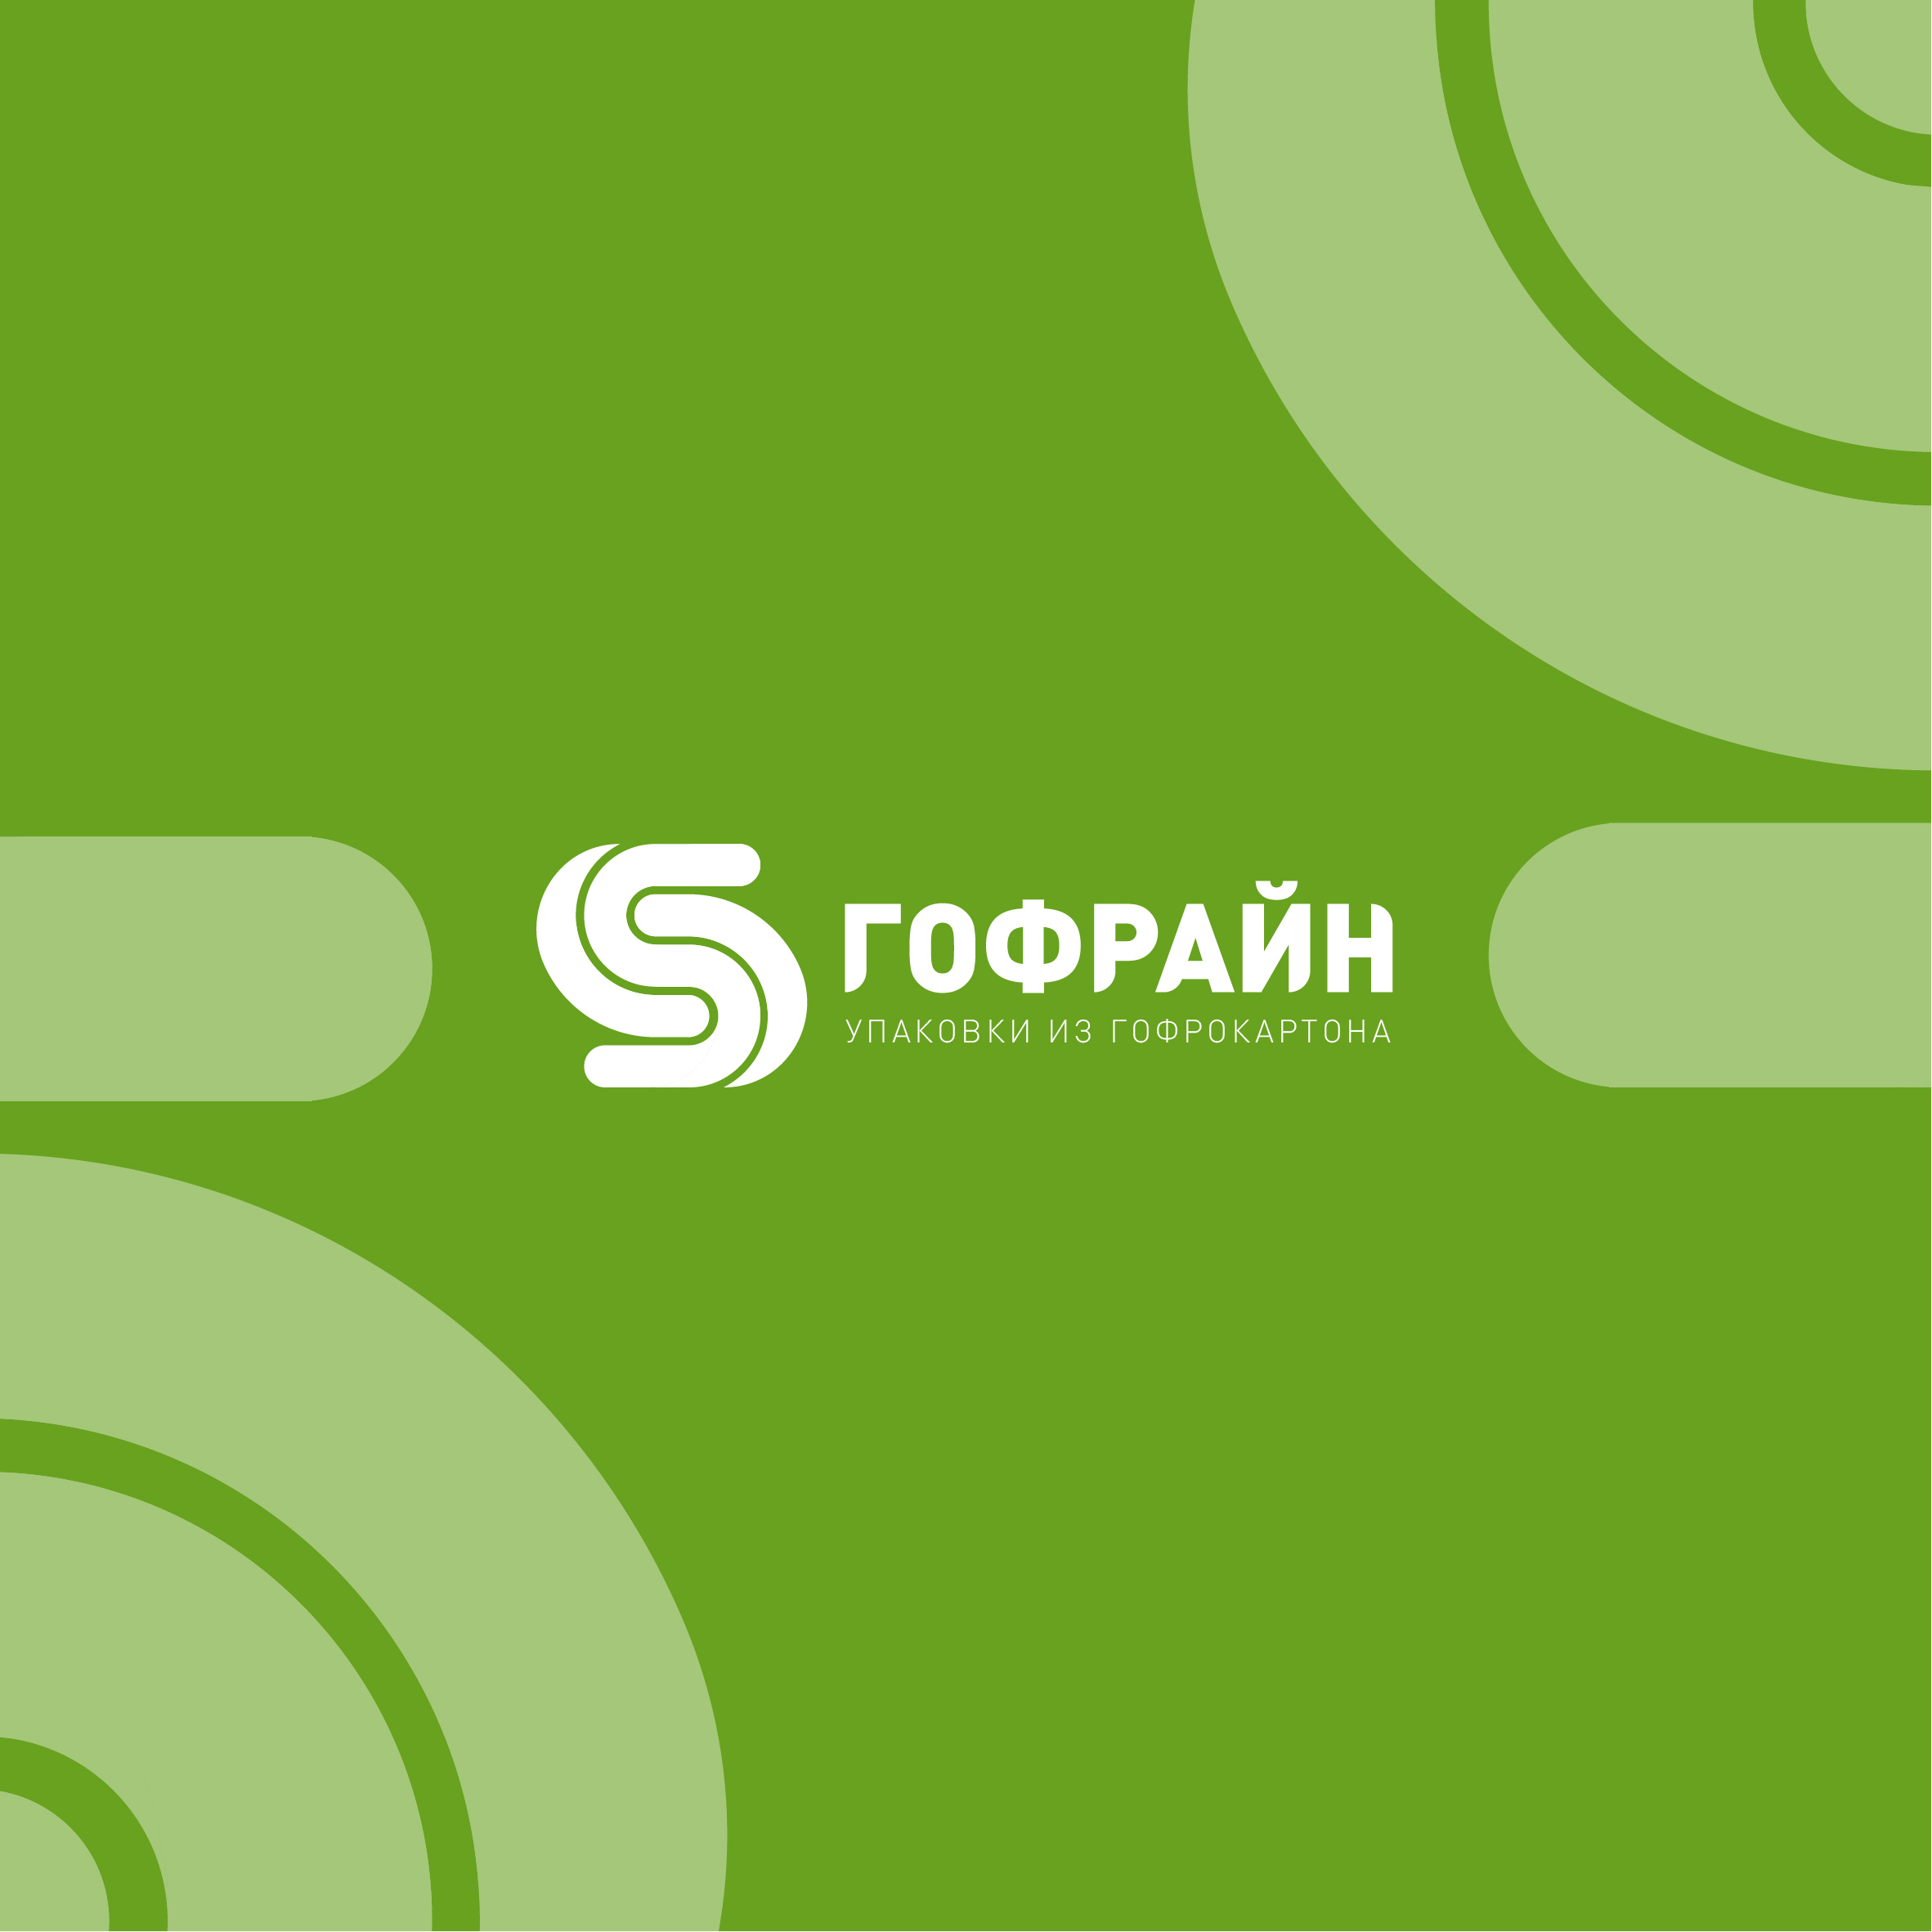 Логотип для компании по реализации упаковки из гофрокартона фото f_2445cdad8d5006bf.jpg